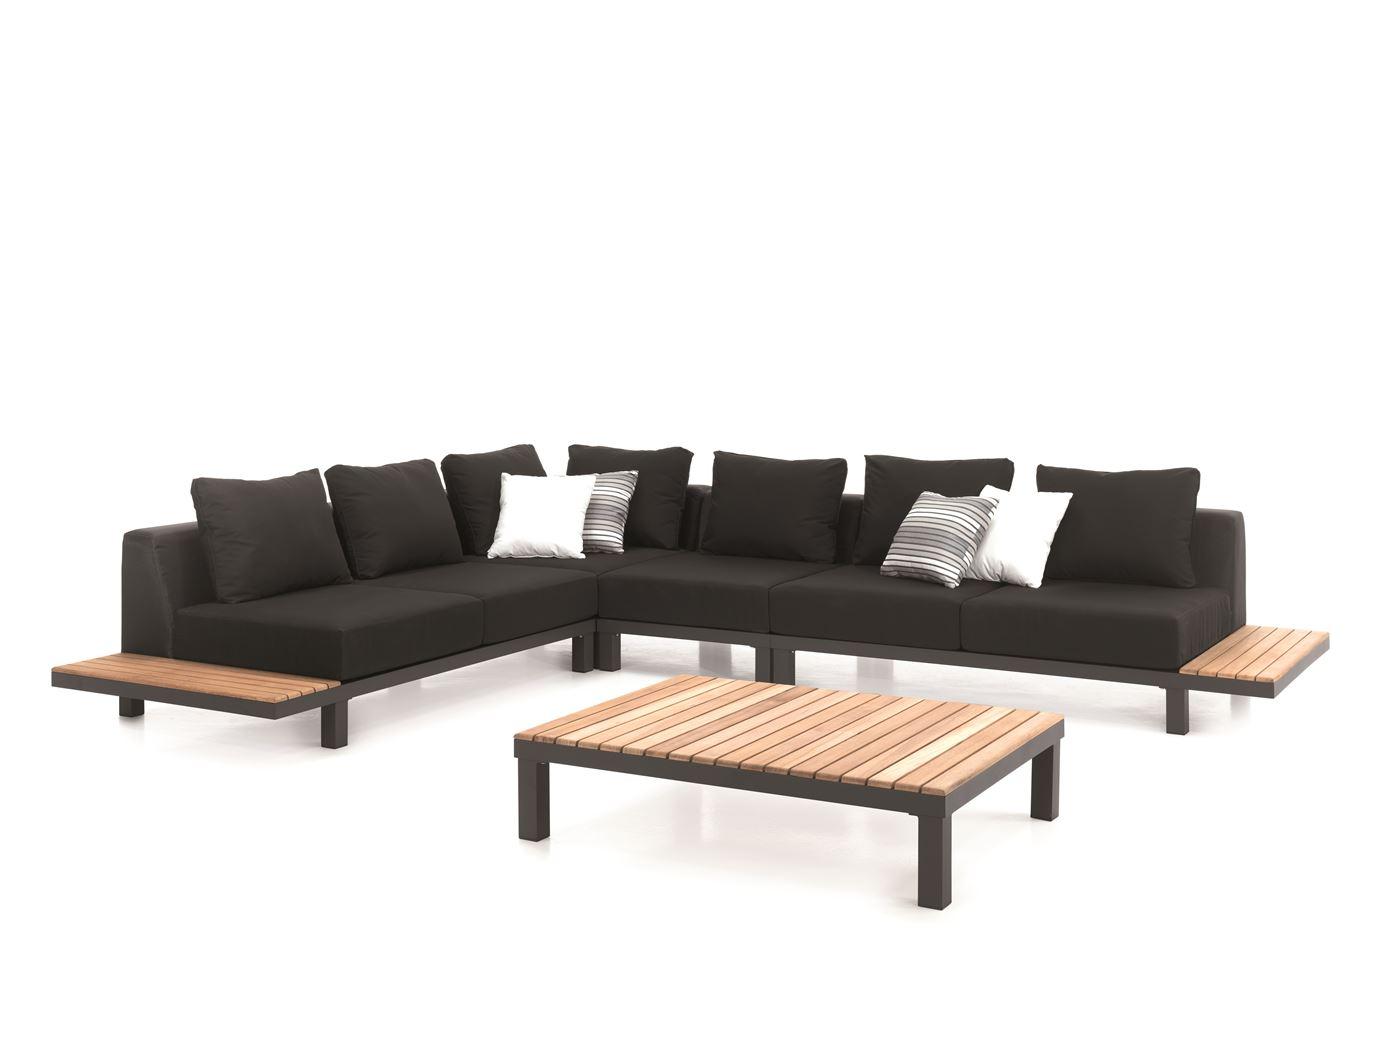 gescova hawai lounge set alu charcoal +teak + textylene bl